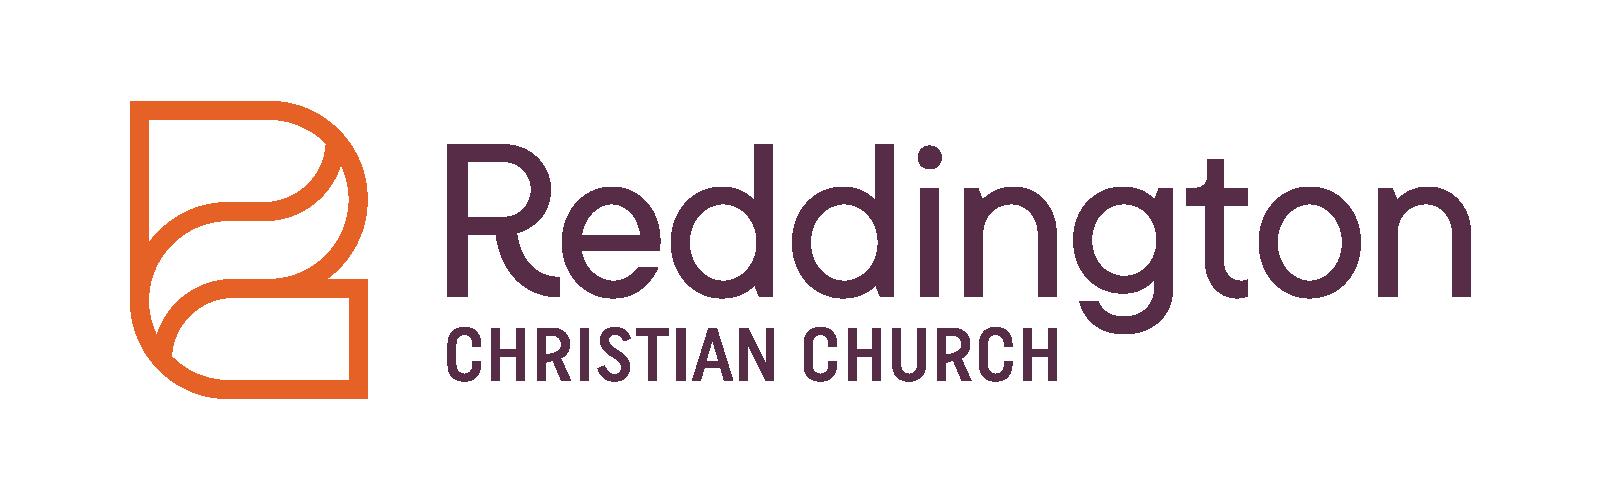 Reddington Christian Church